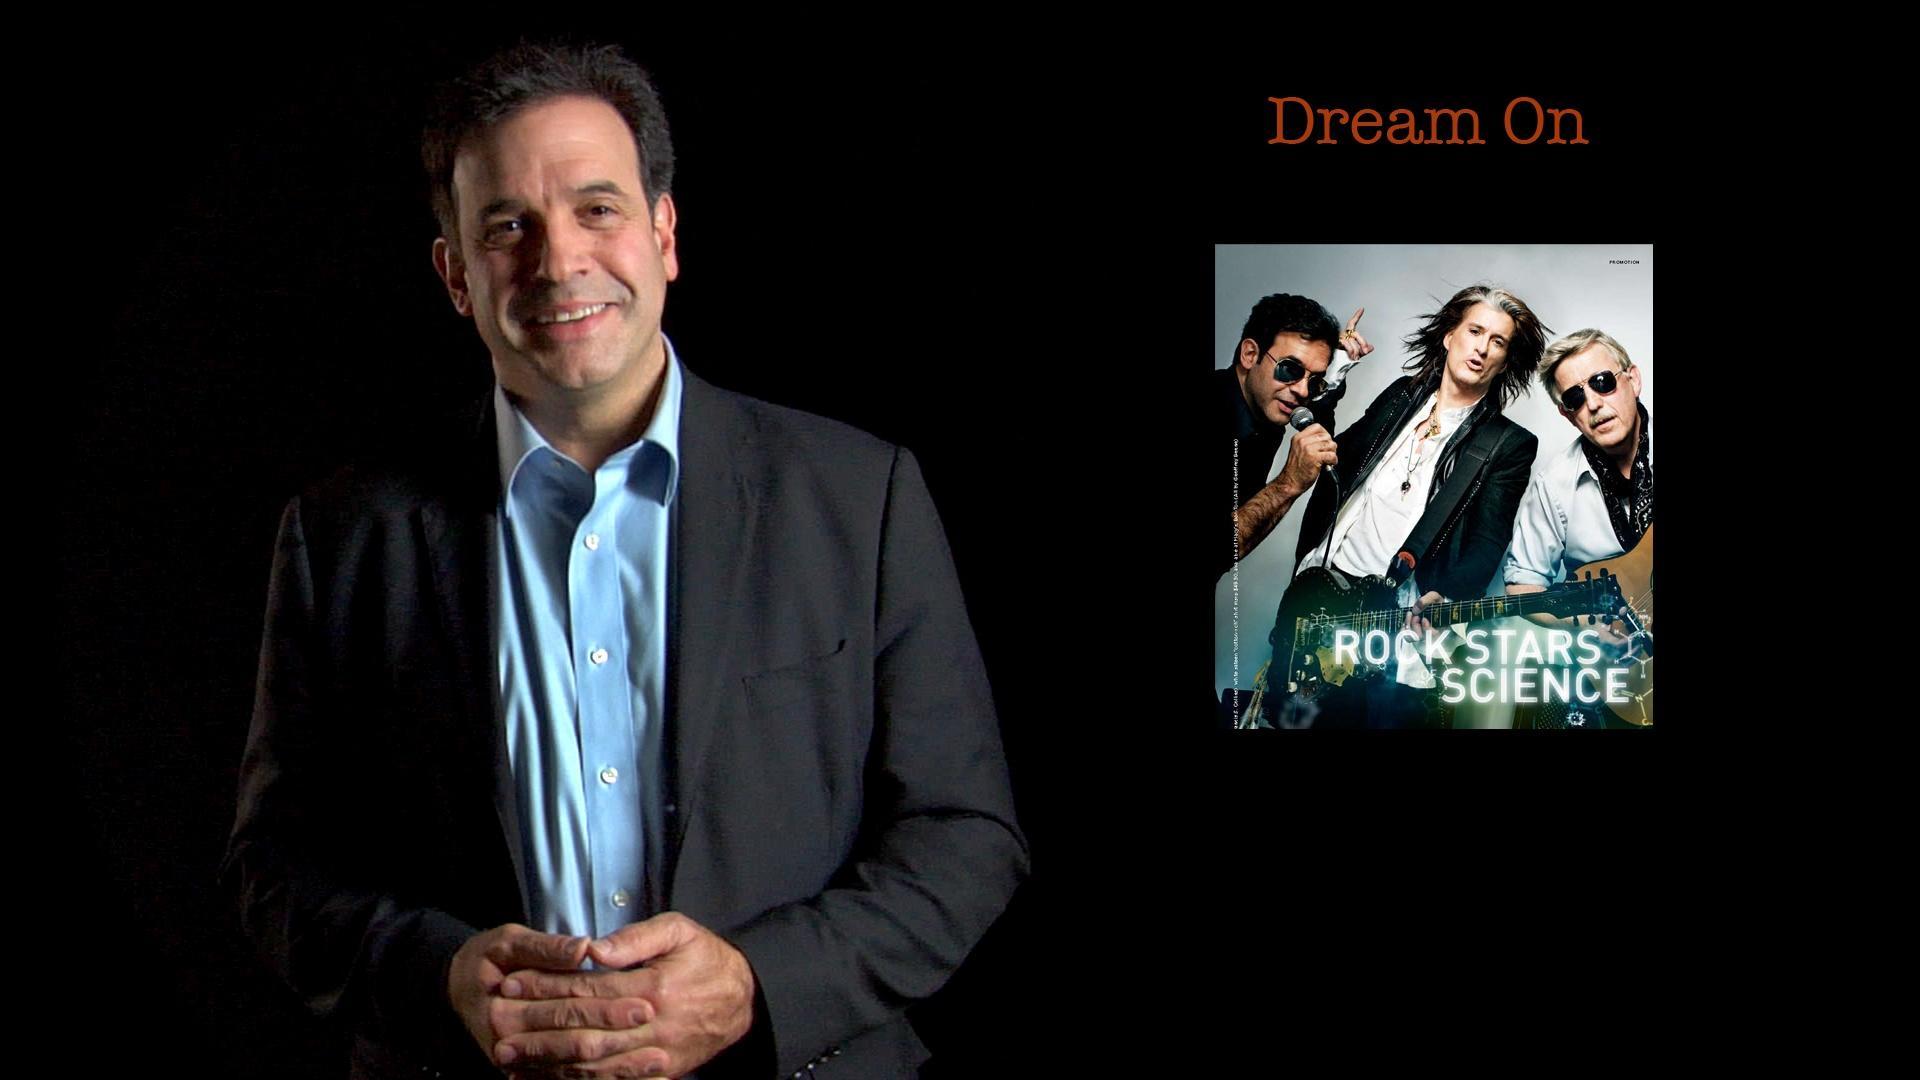 Rudy Tanzi: Dream On image